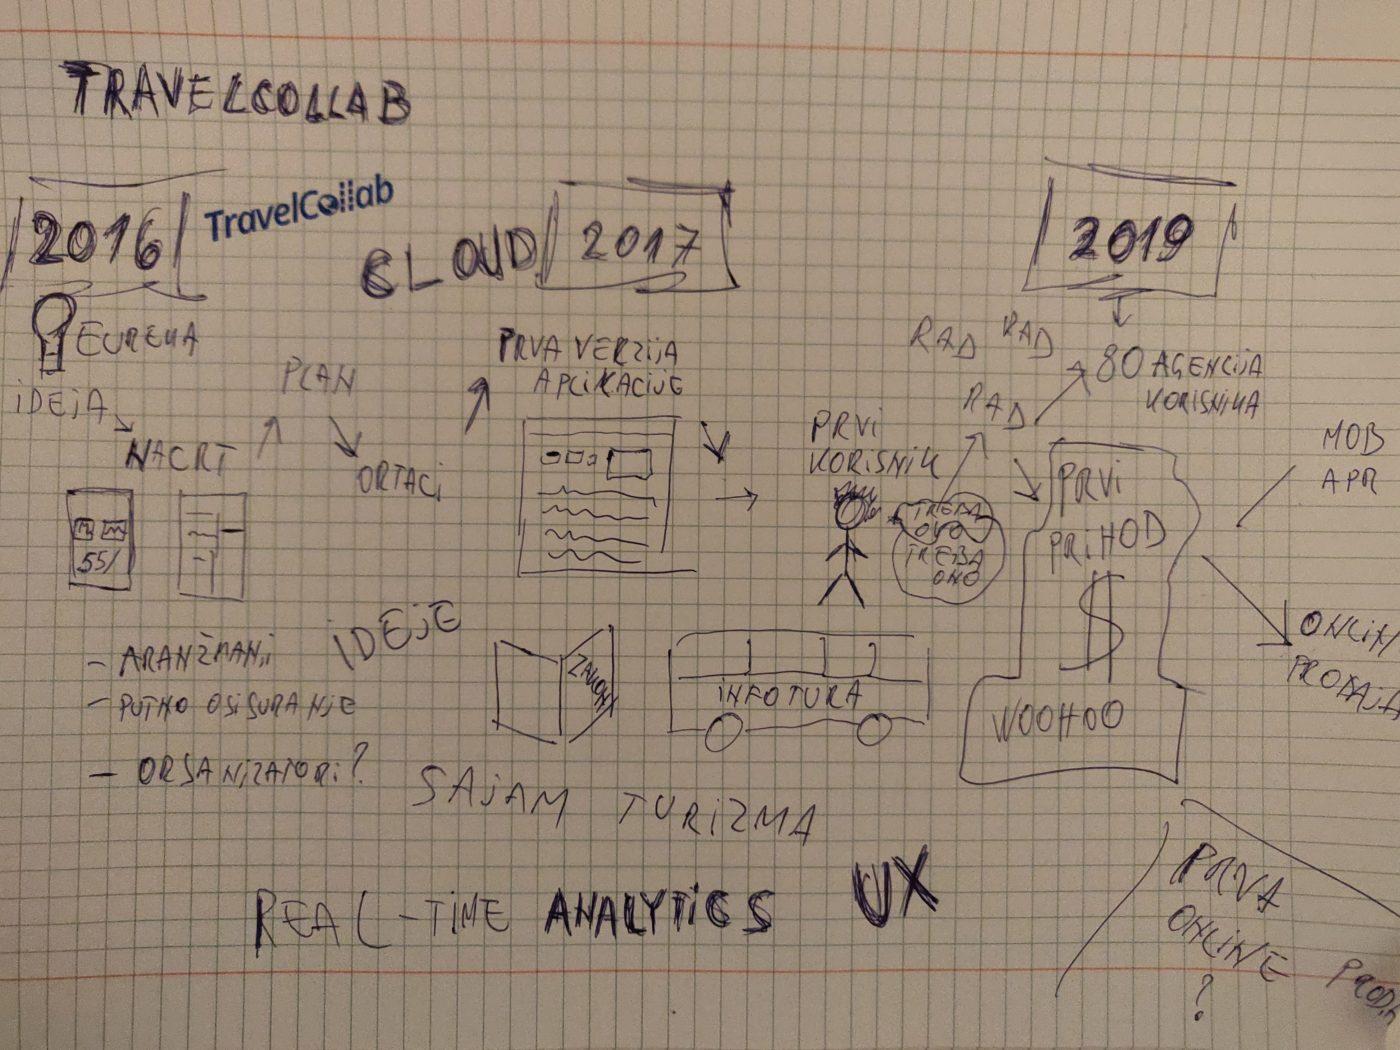 Budućnost Travelcollaba